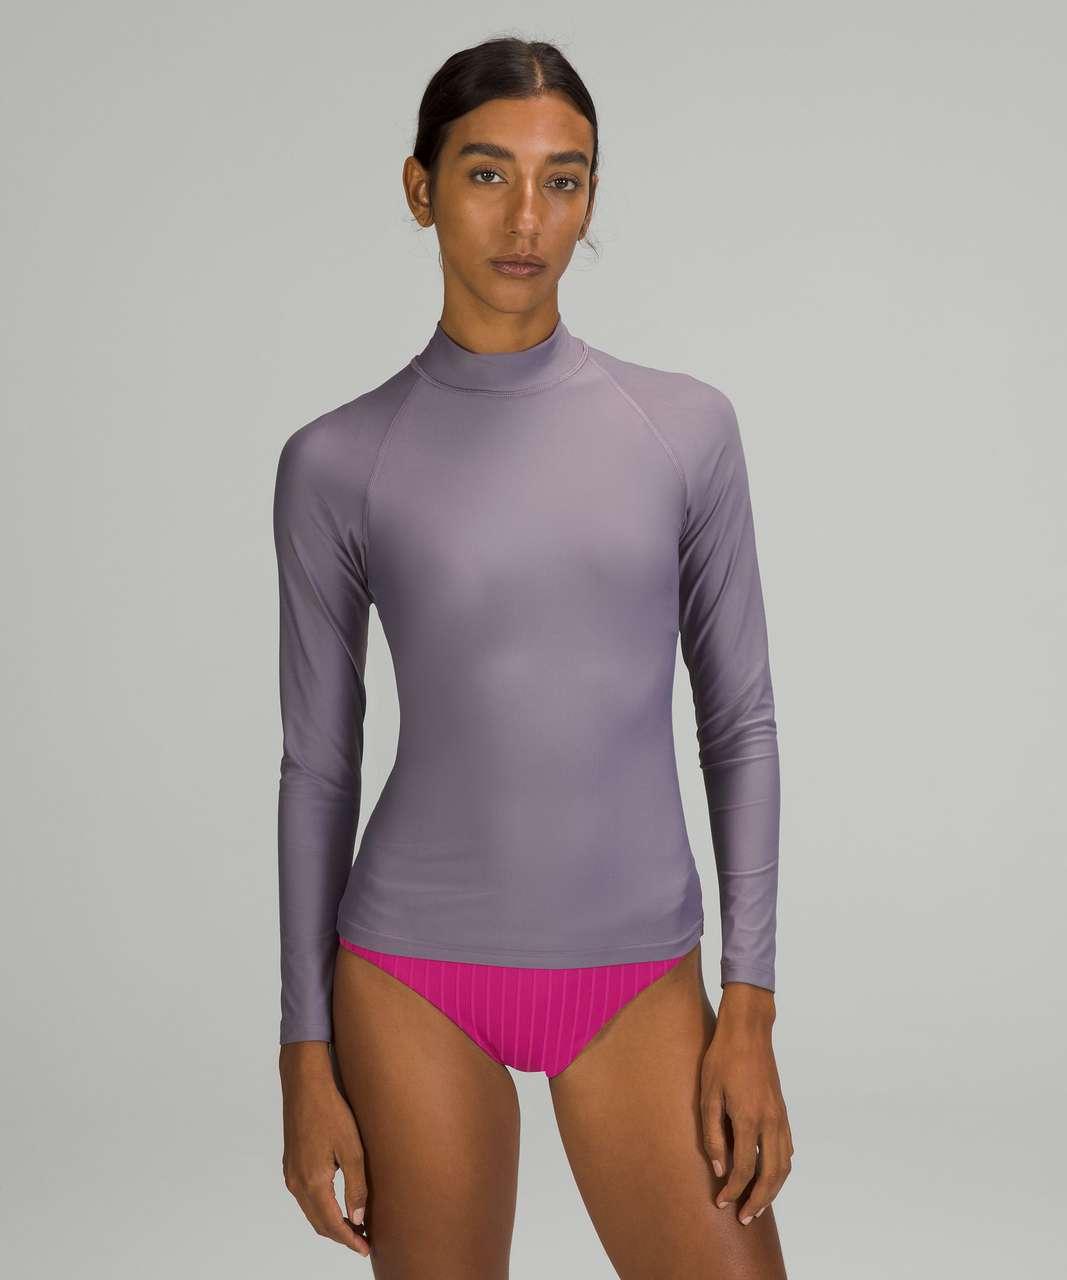 Lululemon Waterside UV Protection Long-Sleeve Rash Guard - Dusky Lavender